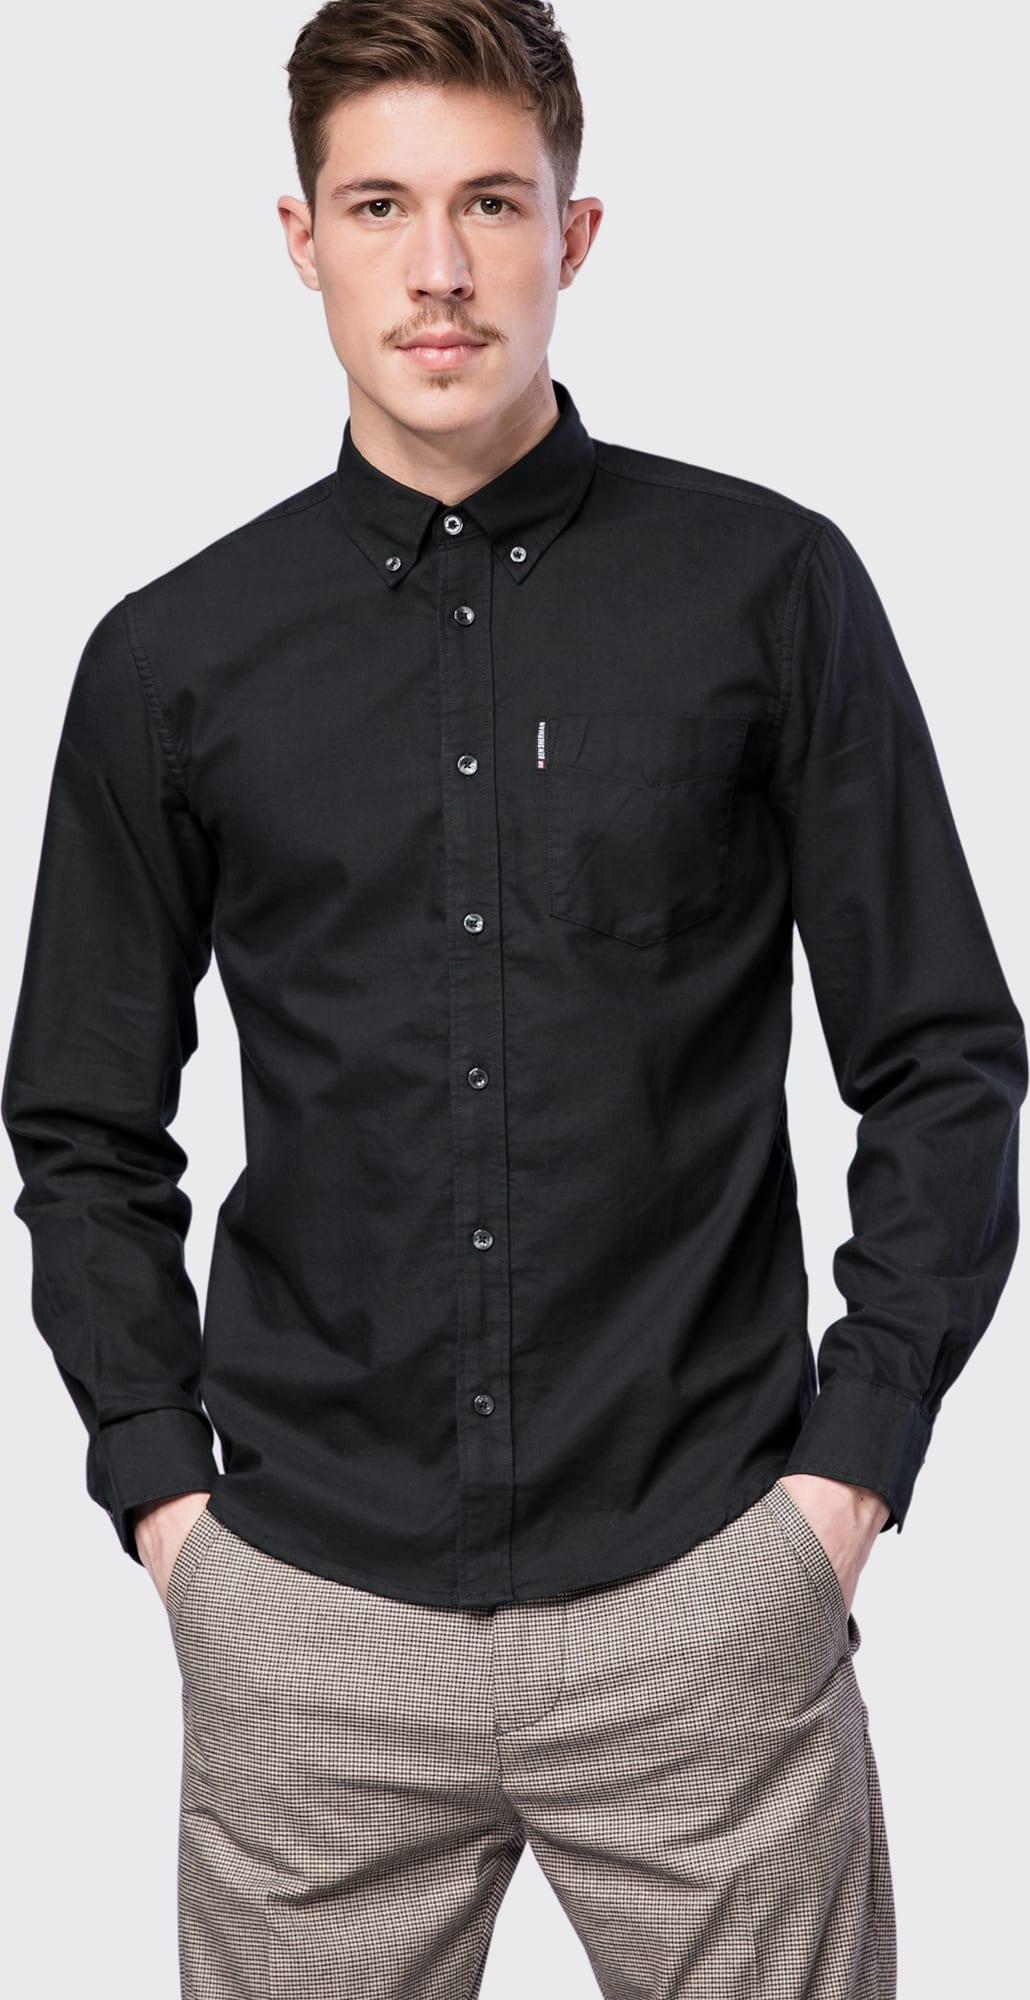 ben sherman hemd 39 ls core oxford shirt 39 in schwarz about you. Black Bedroom Furniture Sets. Home Design Ideas